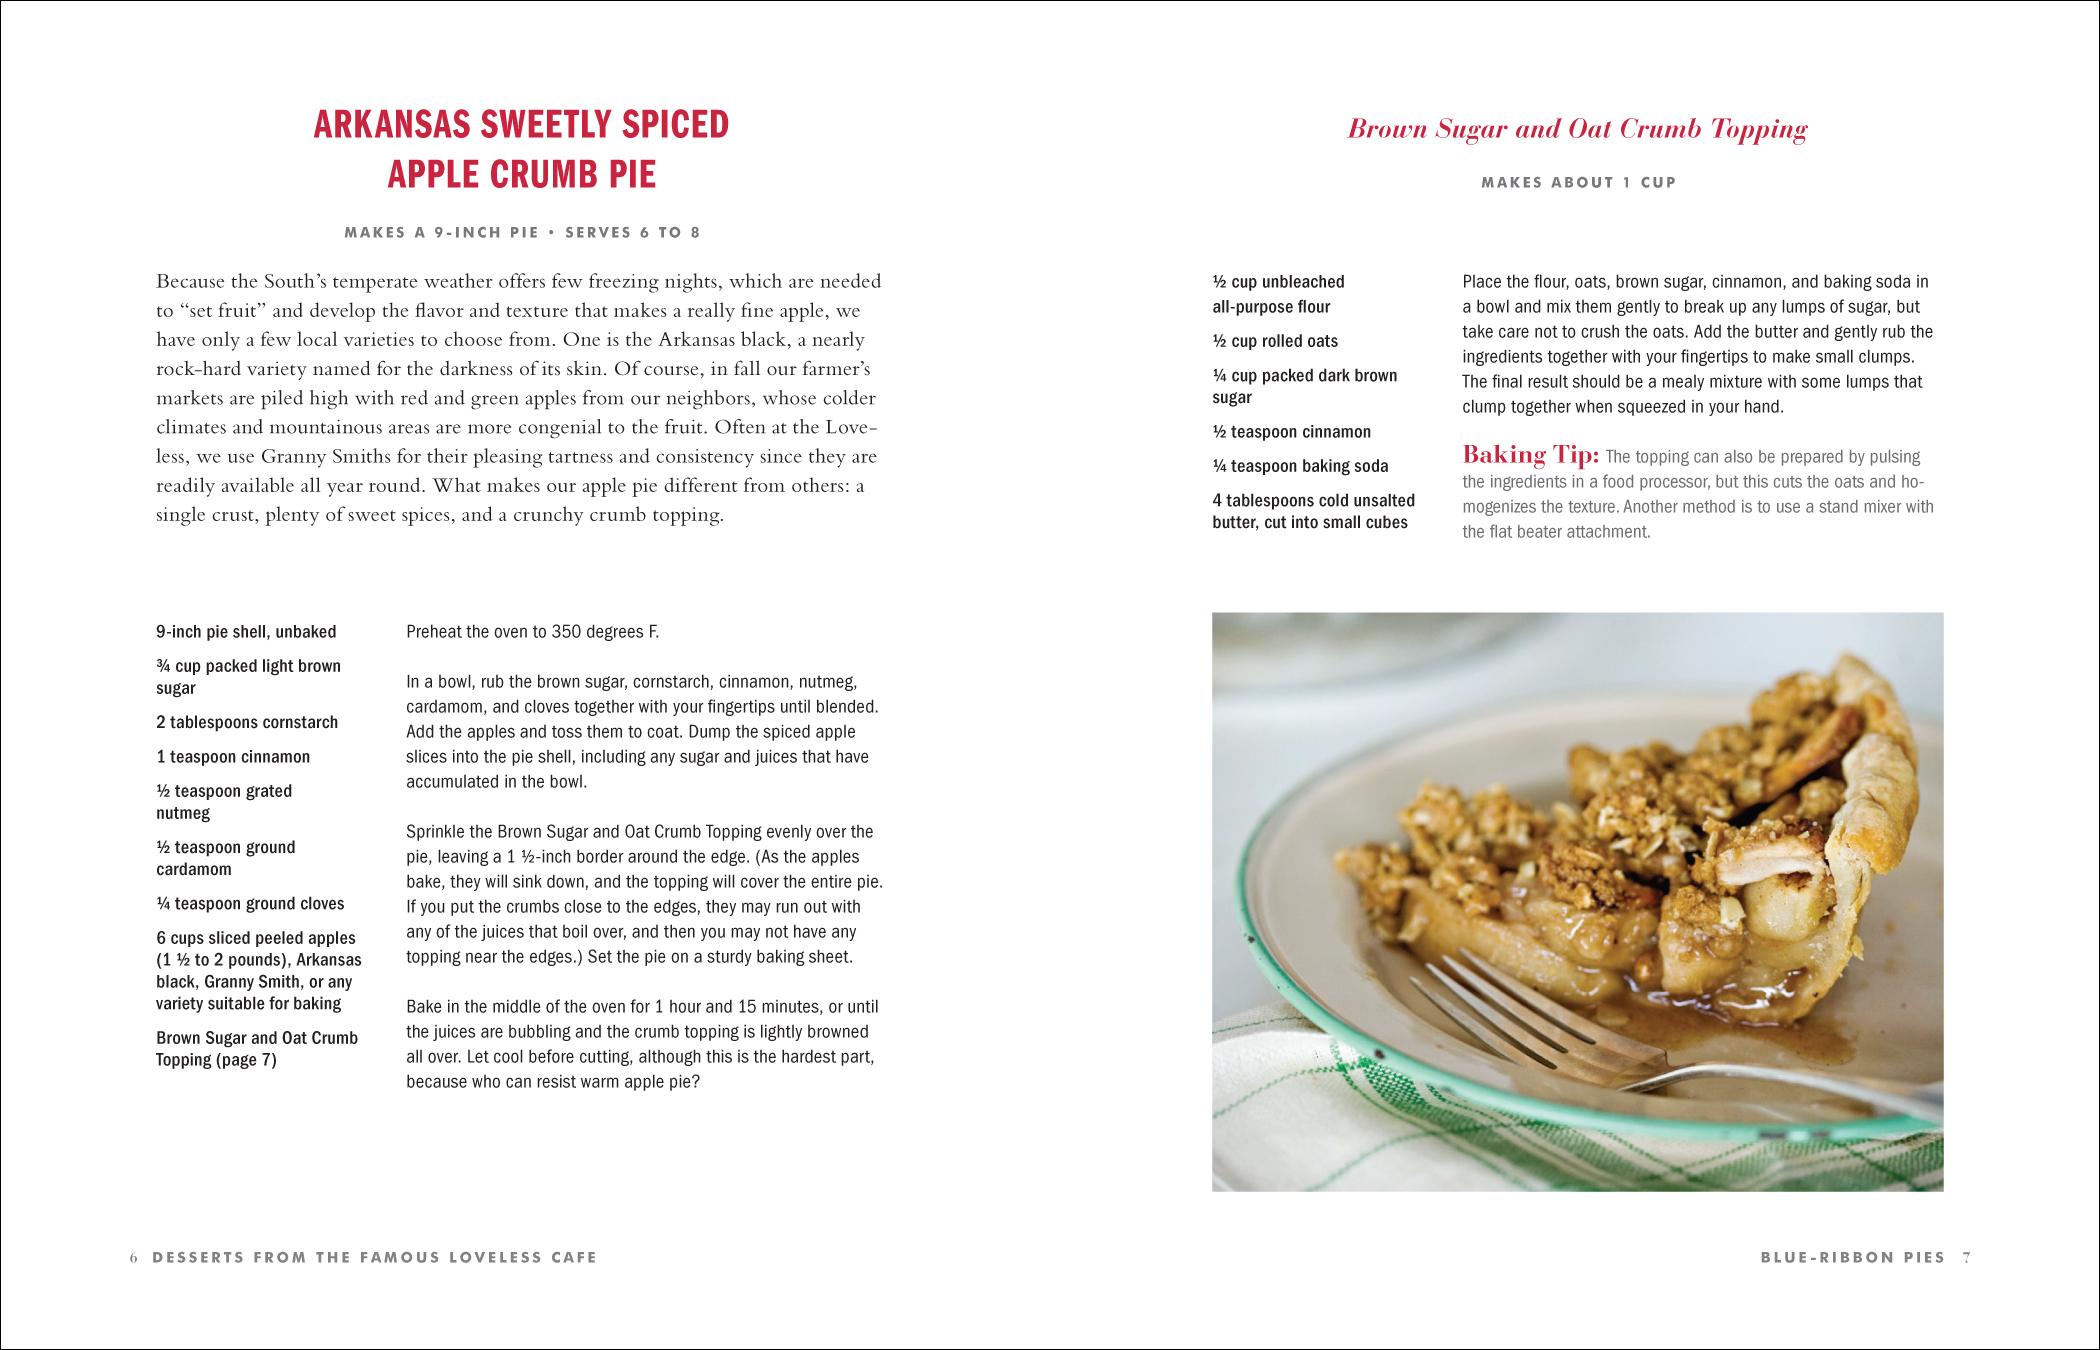 loveless cafe dessert book by susan baldaserini at